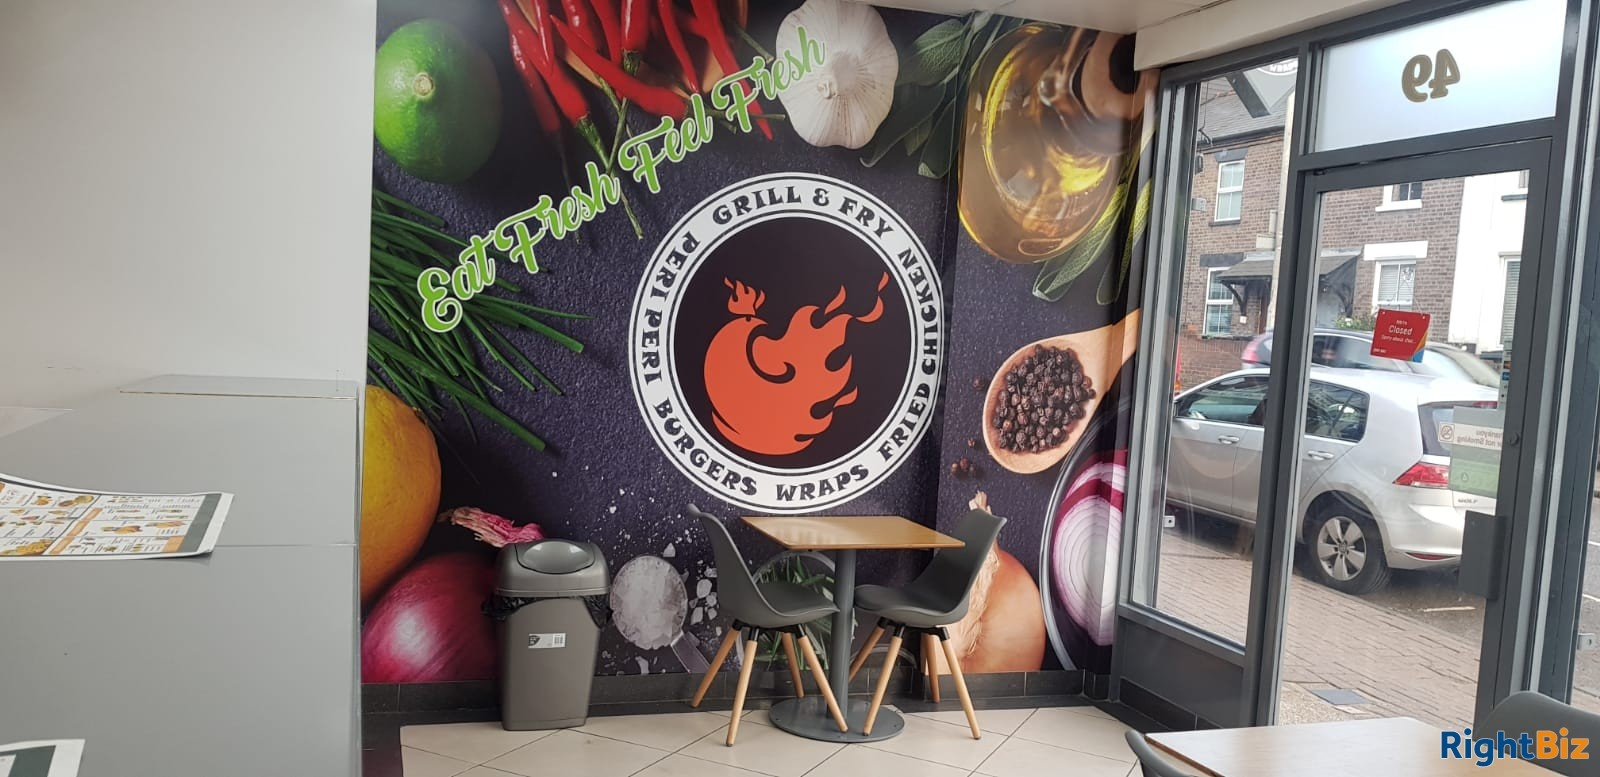 Running Chicken peri-peri shop for sale - Image 4